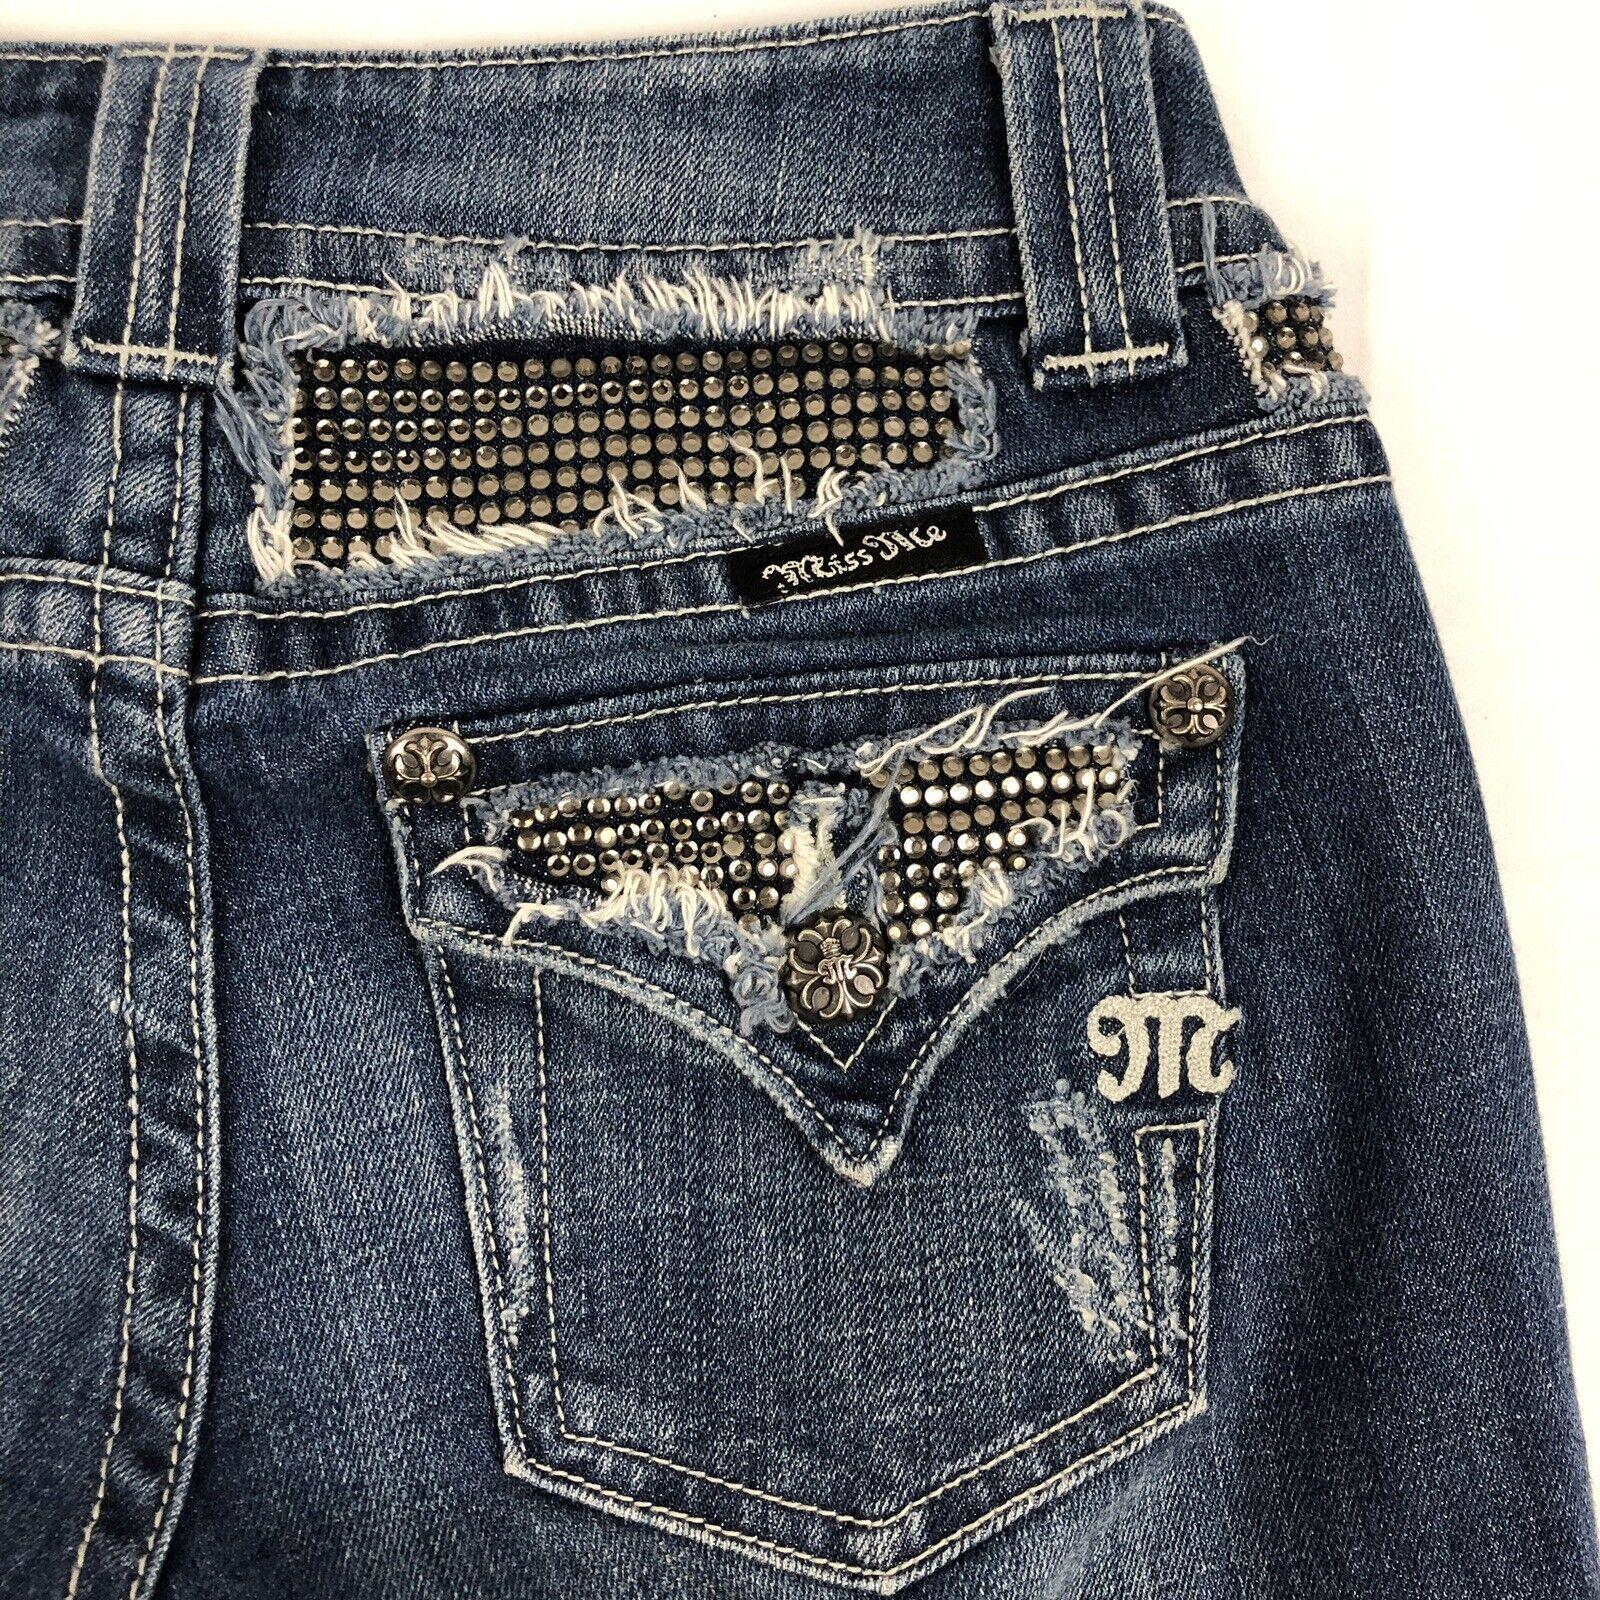 Miss Me Women's 26 Boot Cut Medium Wash Embellished Bling bluee Jeans JP4221R